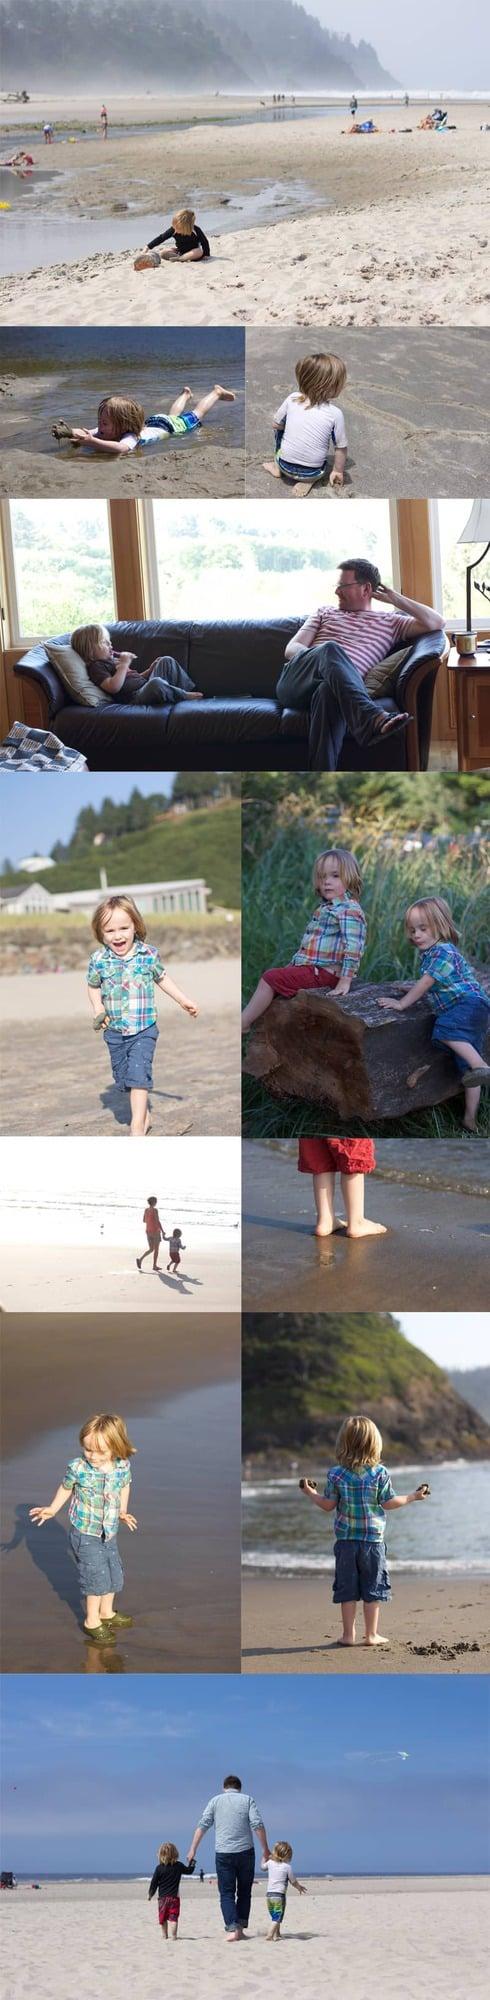 The Beach in Neskowin, Oregon